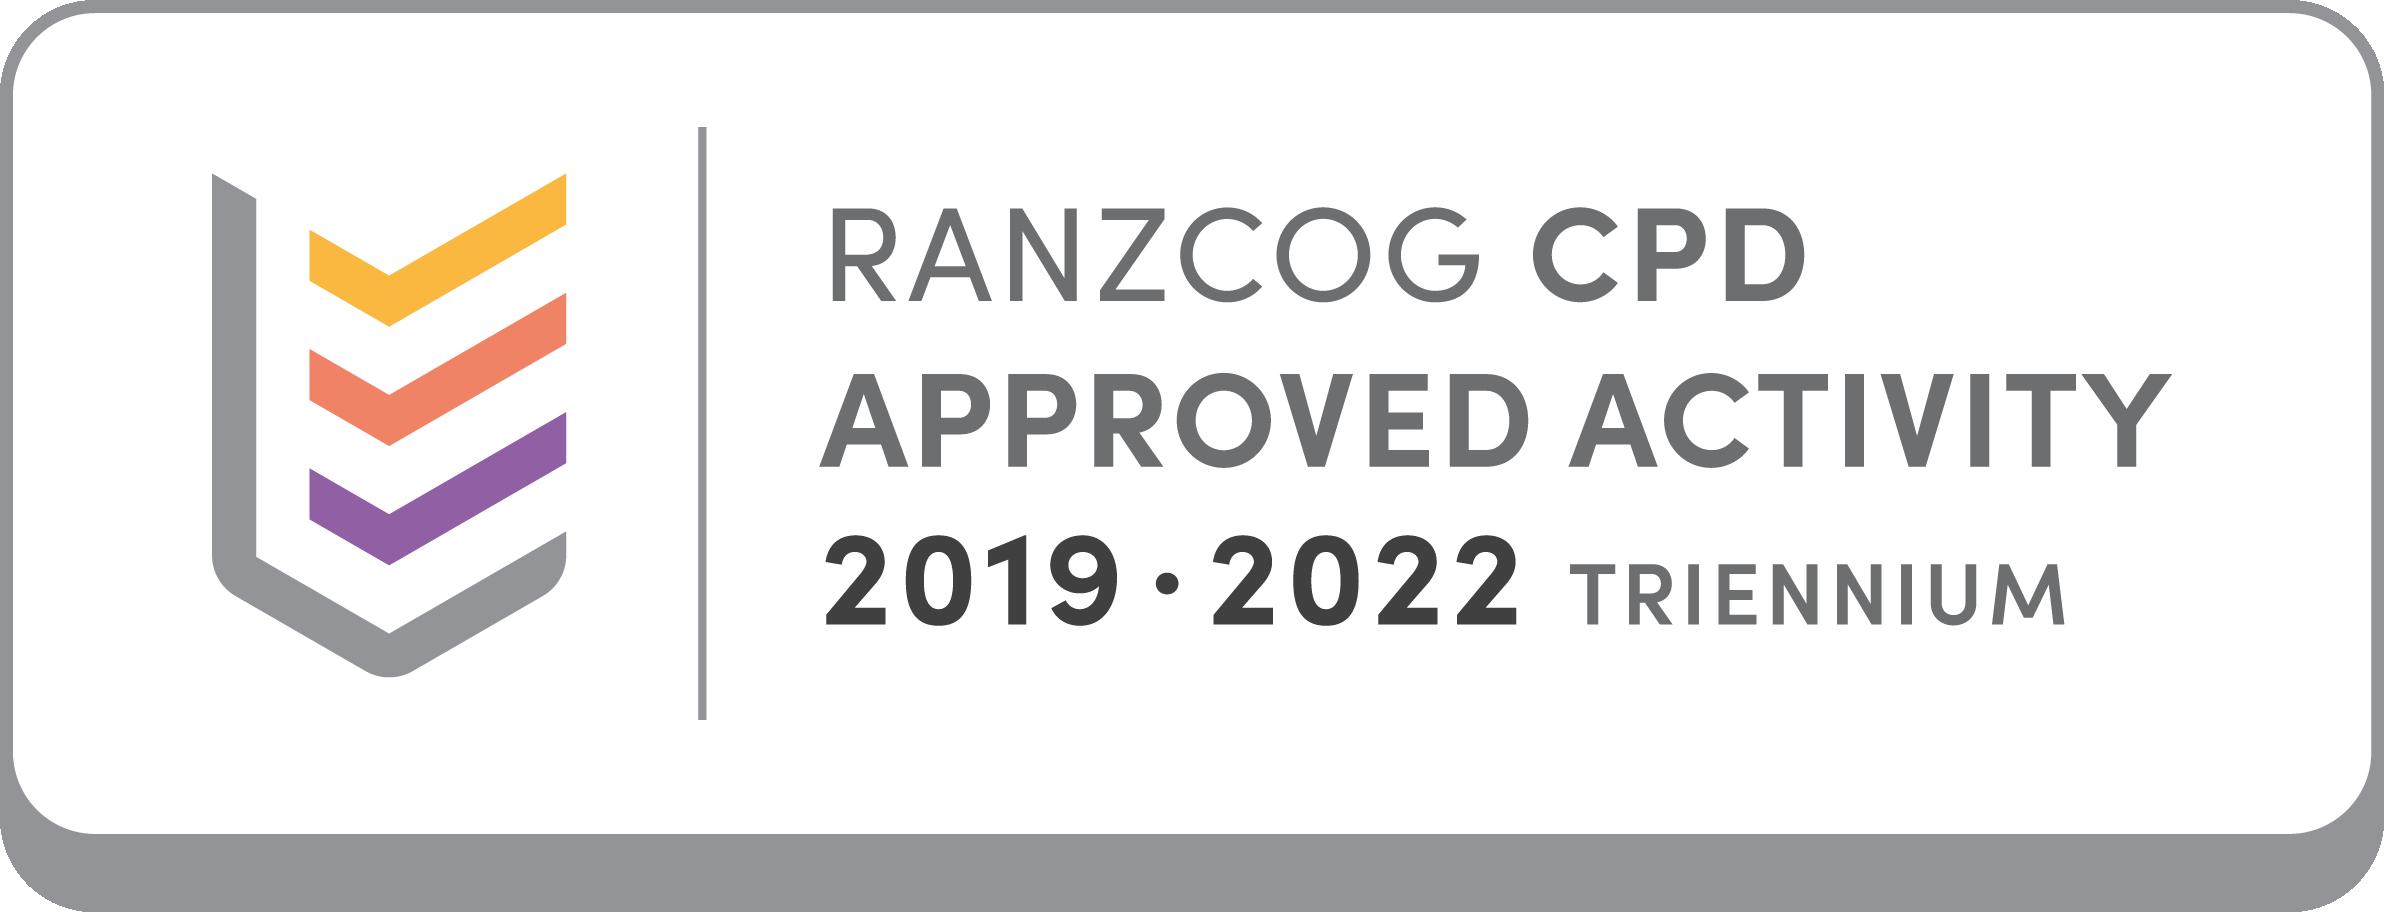 ranzcog-cpd